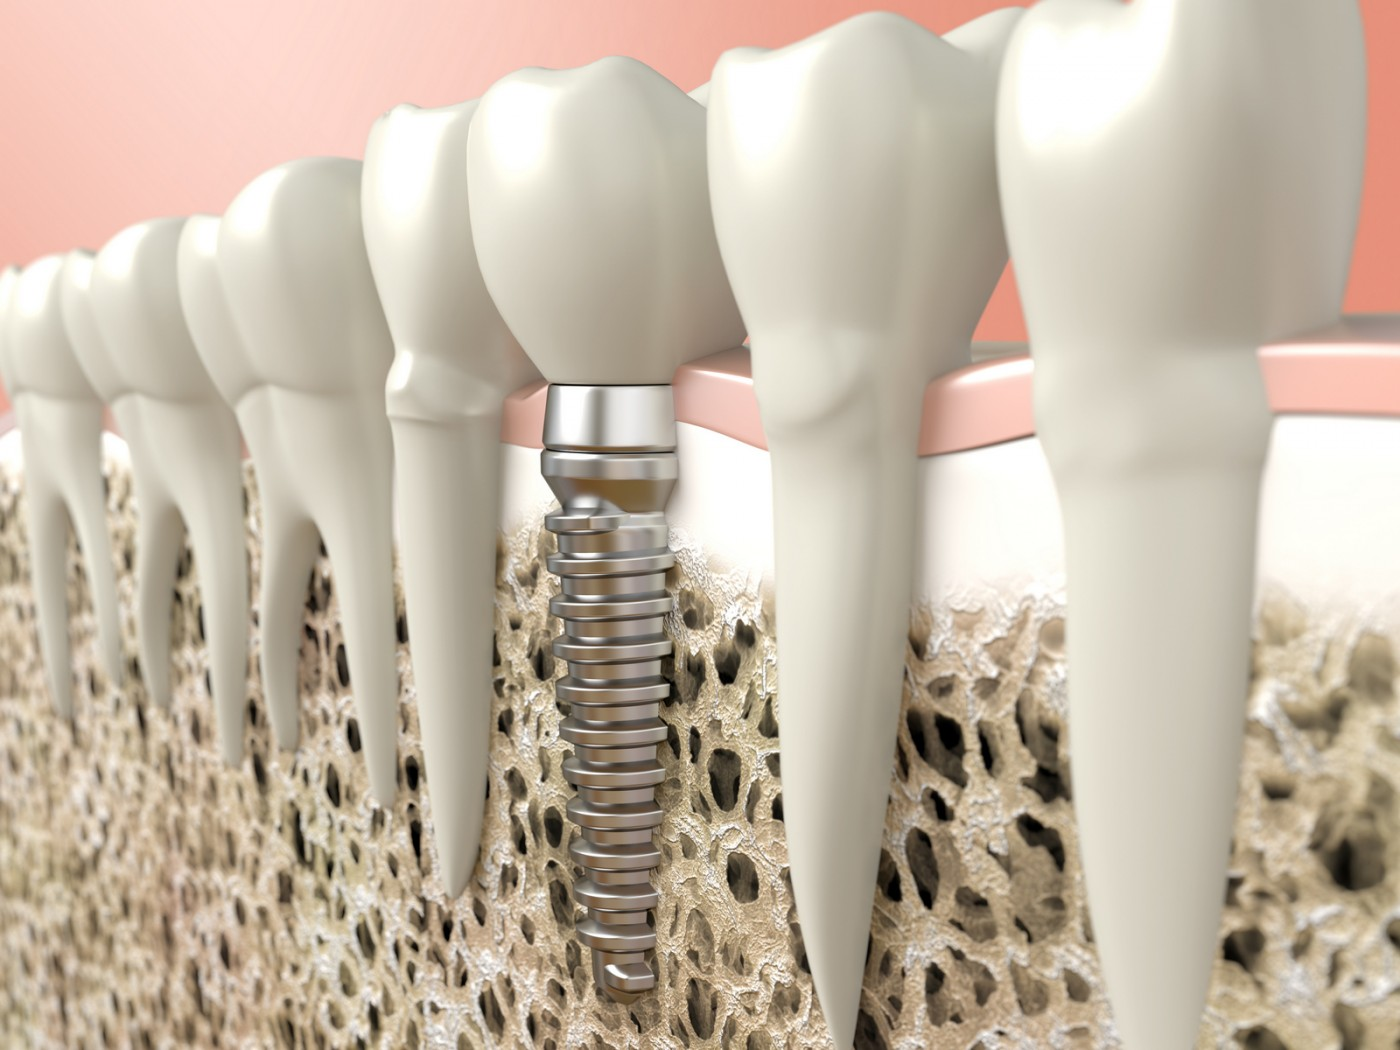 Cât rezistă un implant dentar